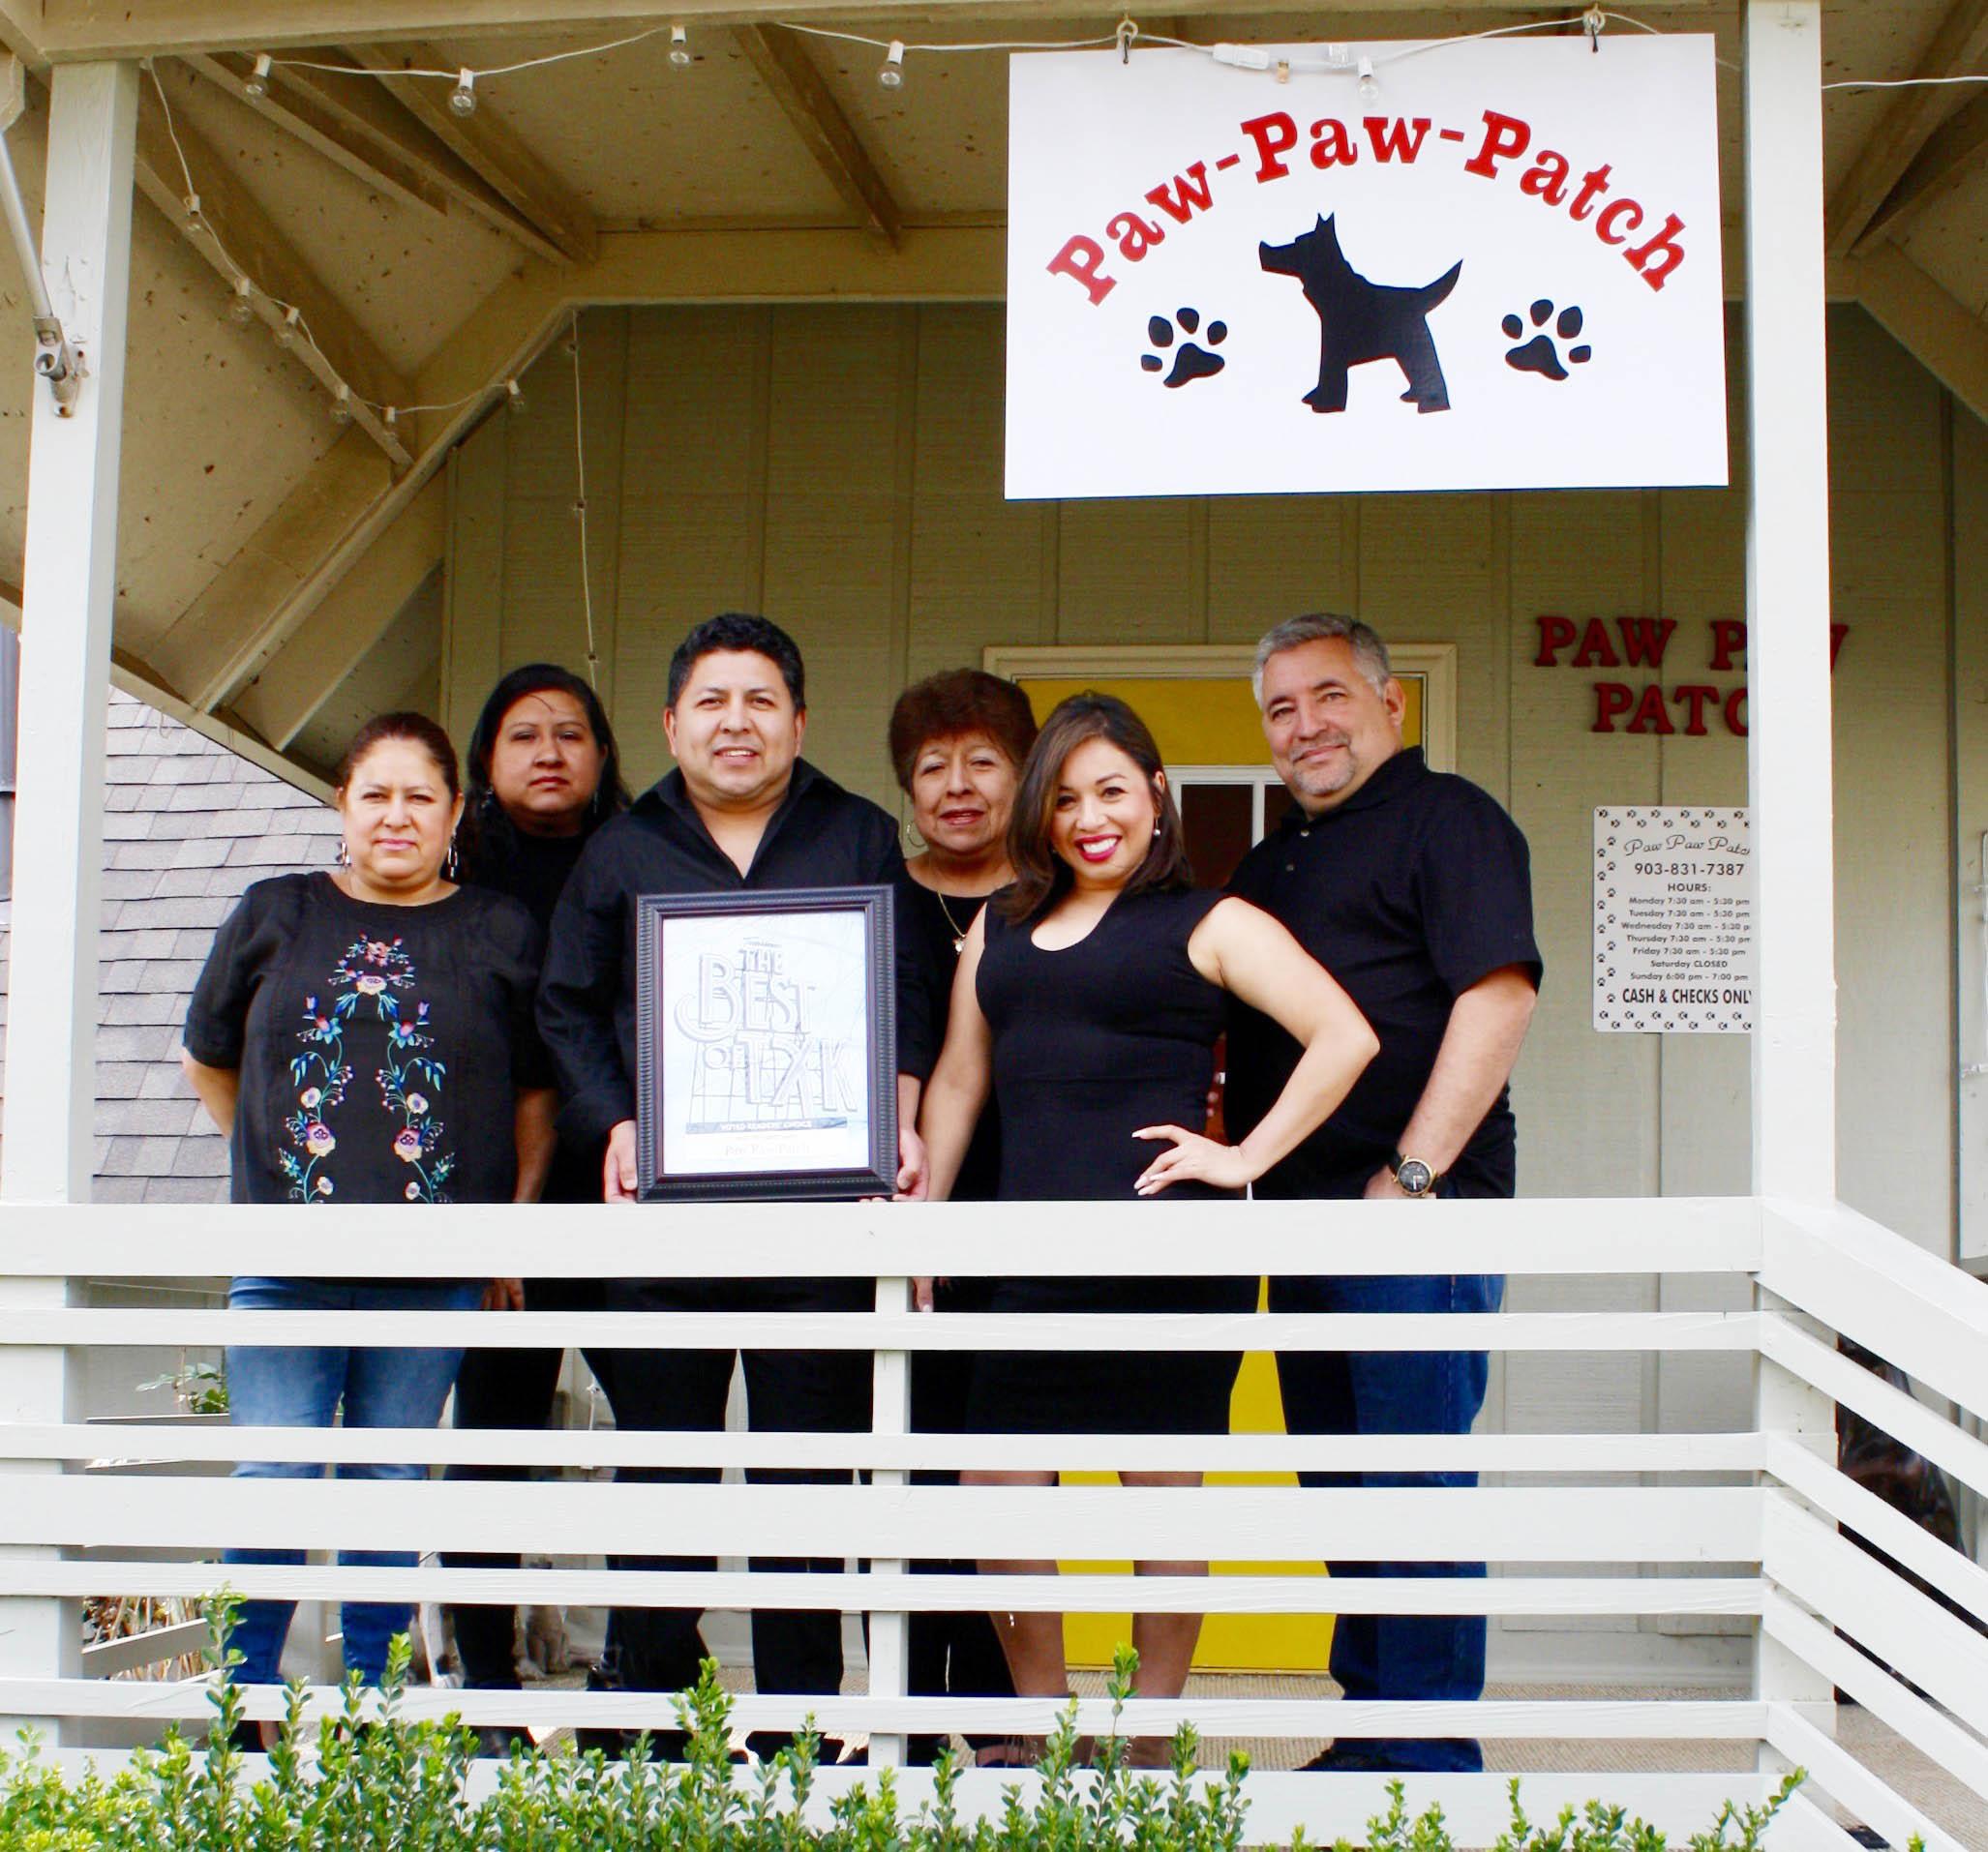 PAW PAW PATCH – Consuelo Gonzalez, Teresa Leyva, Tavo Cruz, Coco Morales, Marta Rea and Roly Yanes